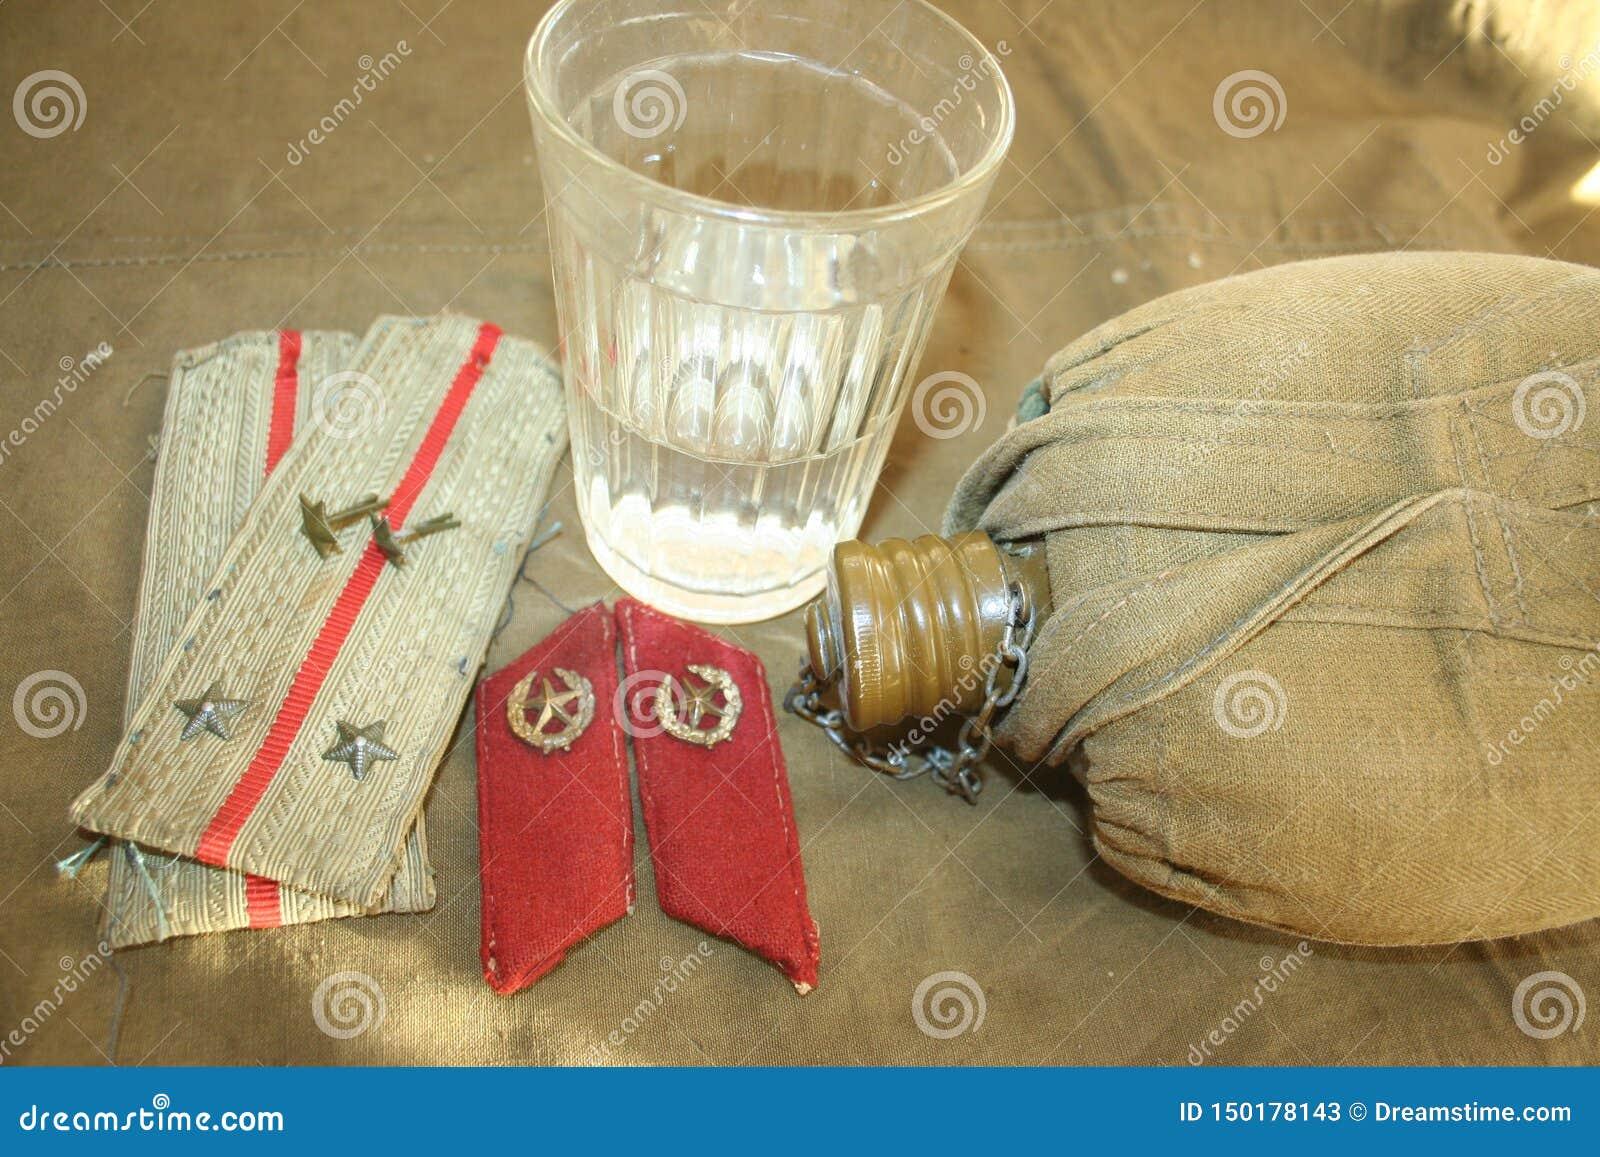 Infanterie-Leutnant wurde der Rang älteren Leutnants zugesprochen